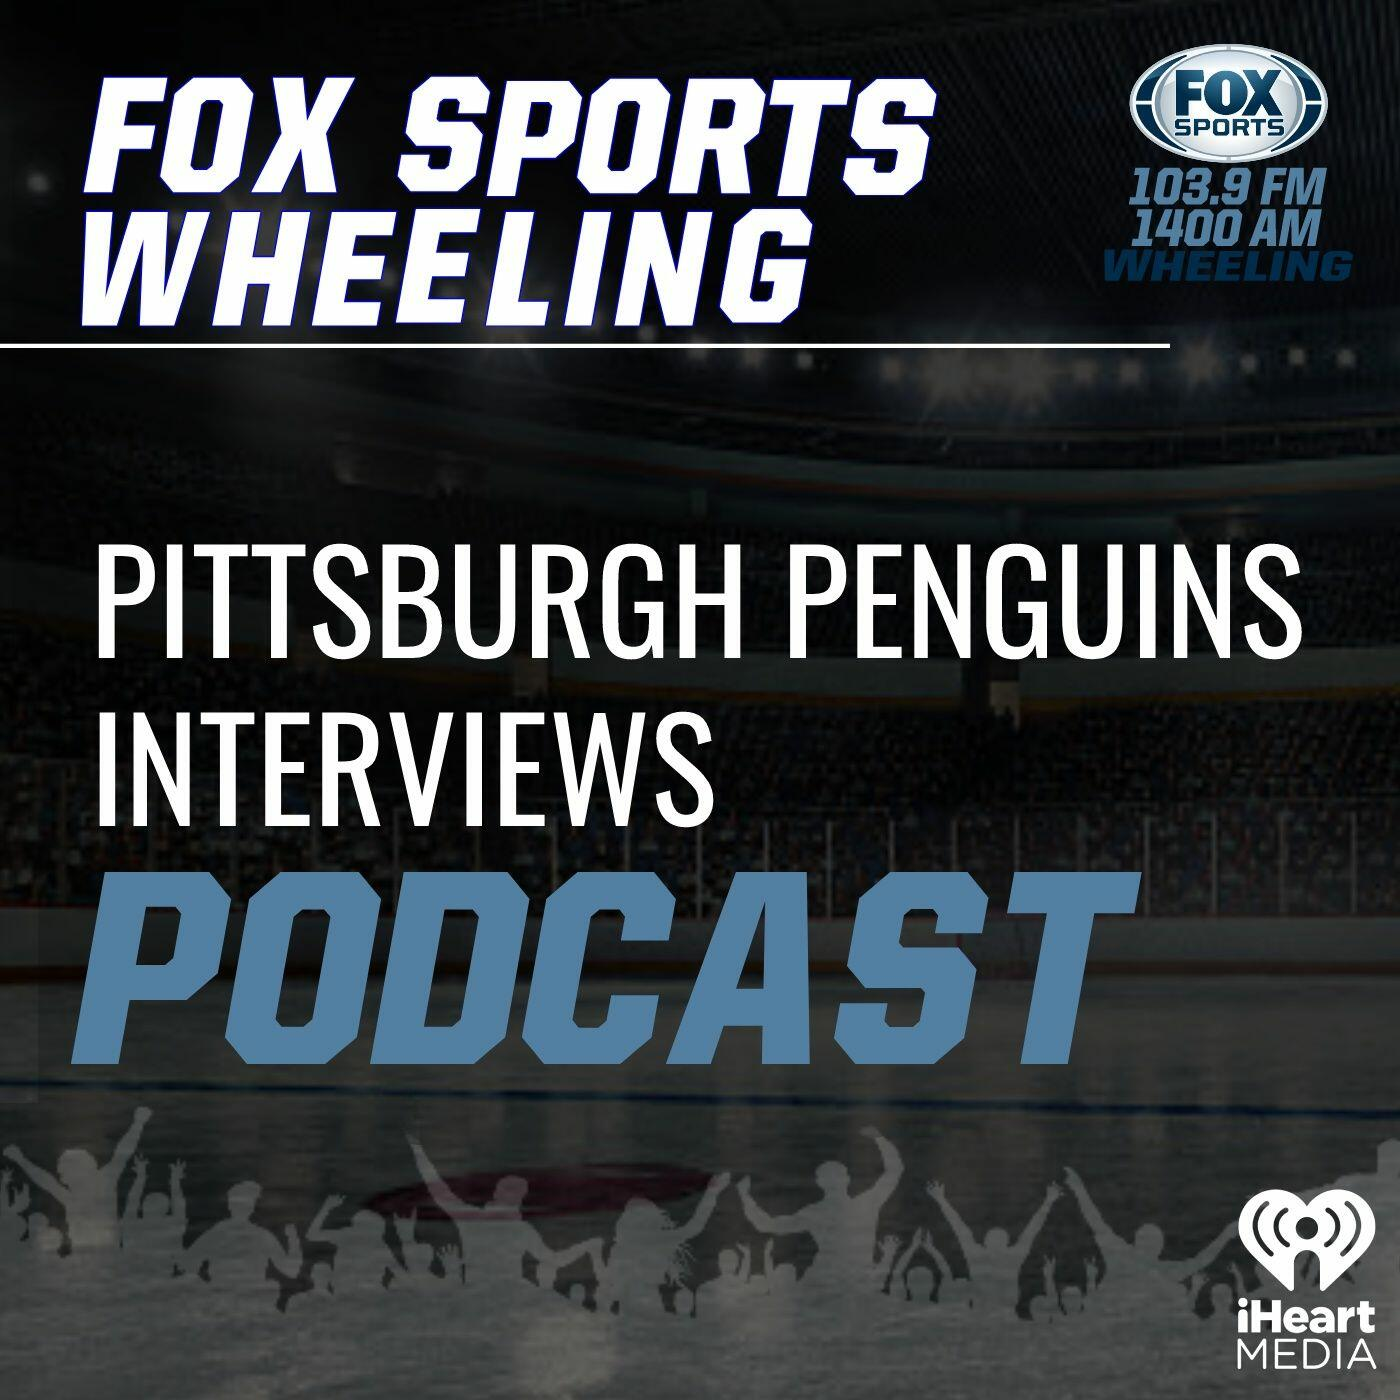 Pittsburgh Penguins Interviews